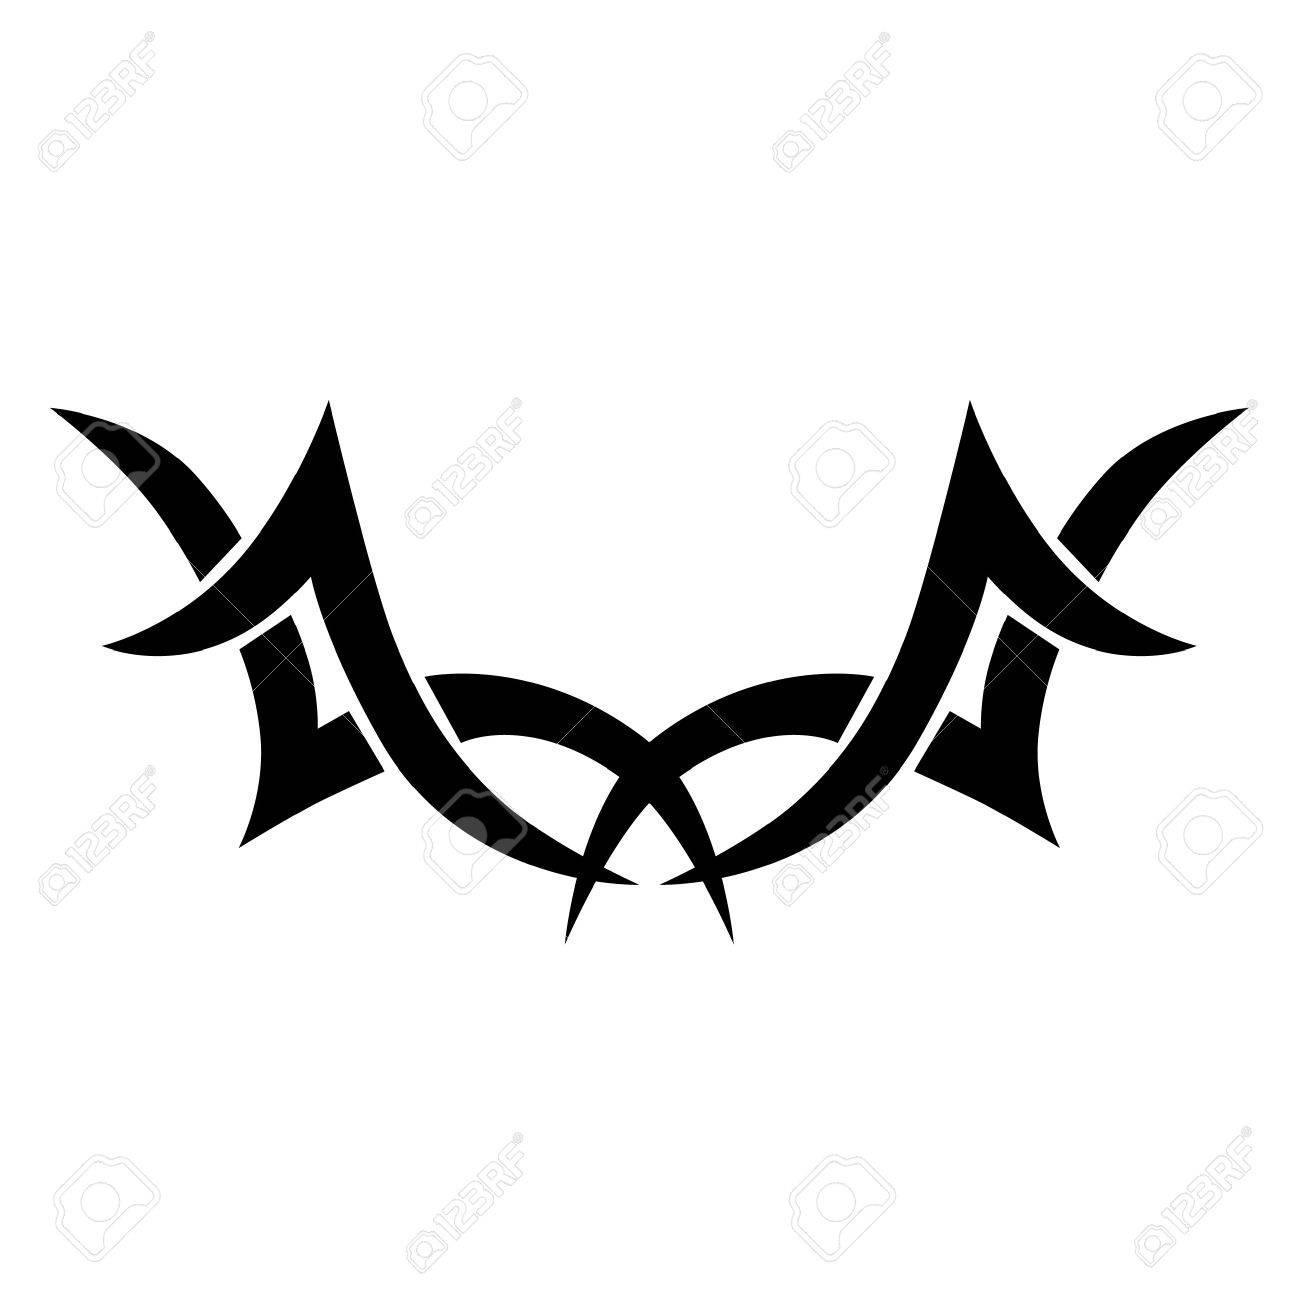 tribal designs tribal tattoos art tribal tattoo vector sketch rh 123rf com tattoo vector free tattoo vector eps